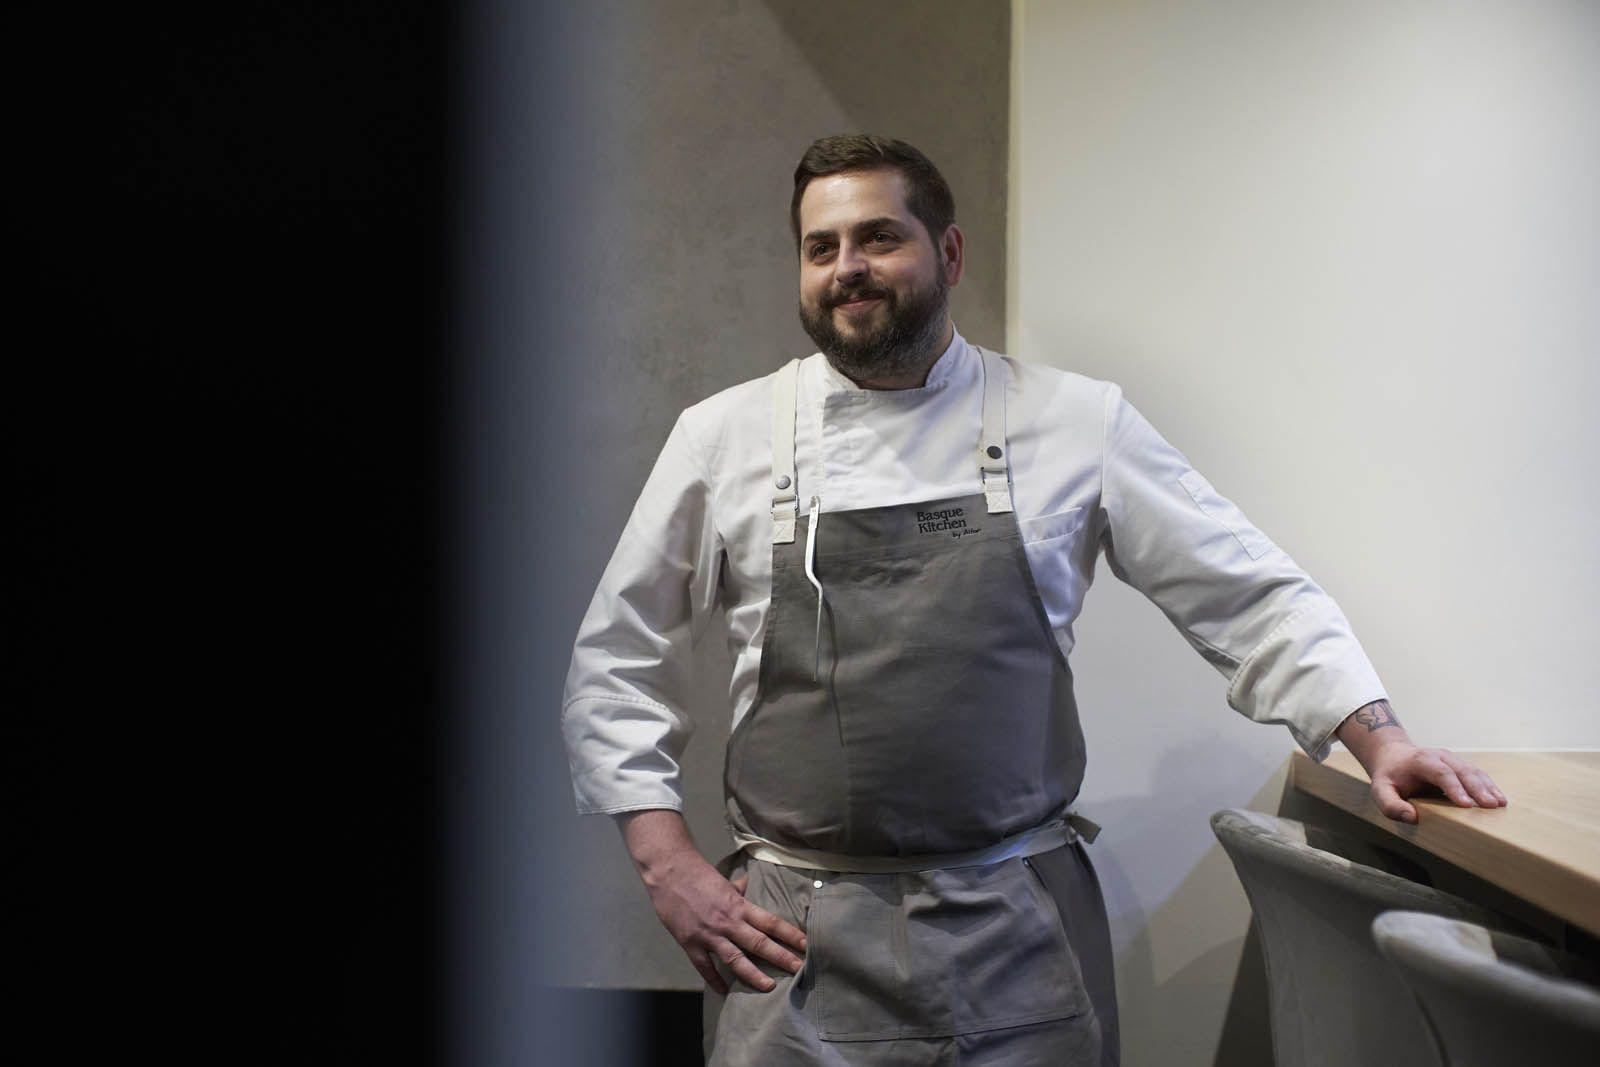 Chef-patron Aitor Jeronimo Orive